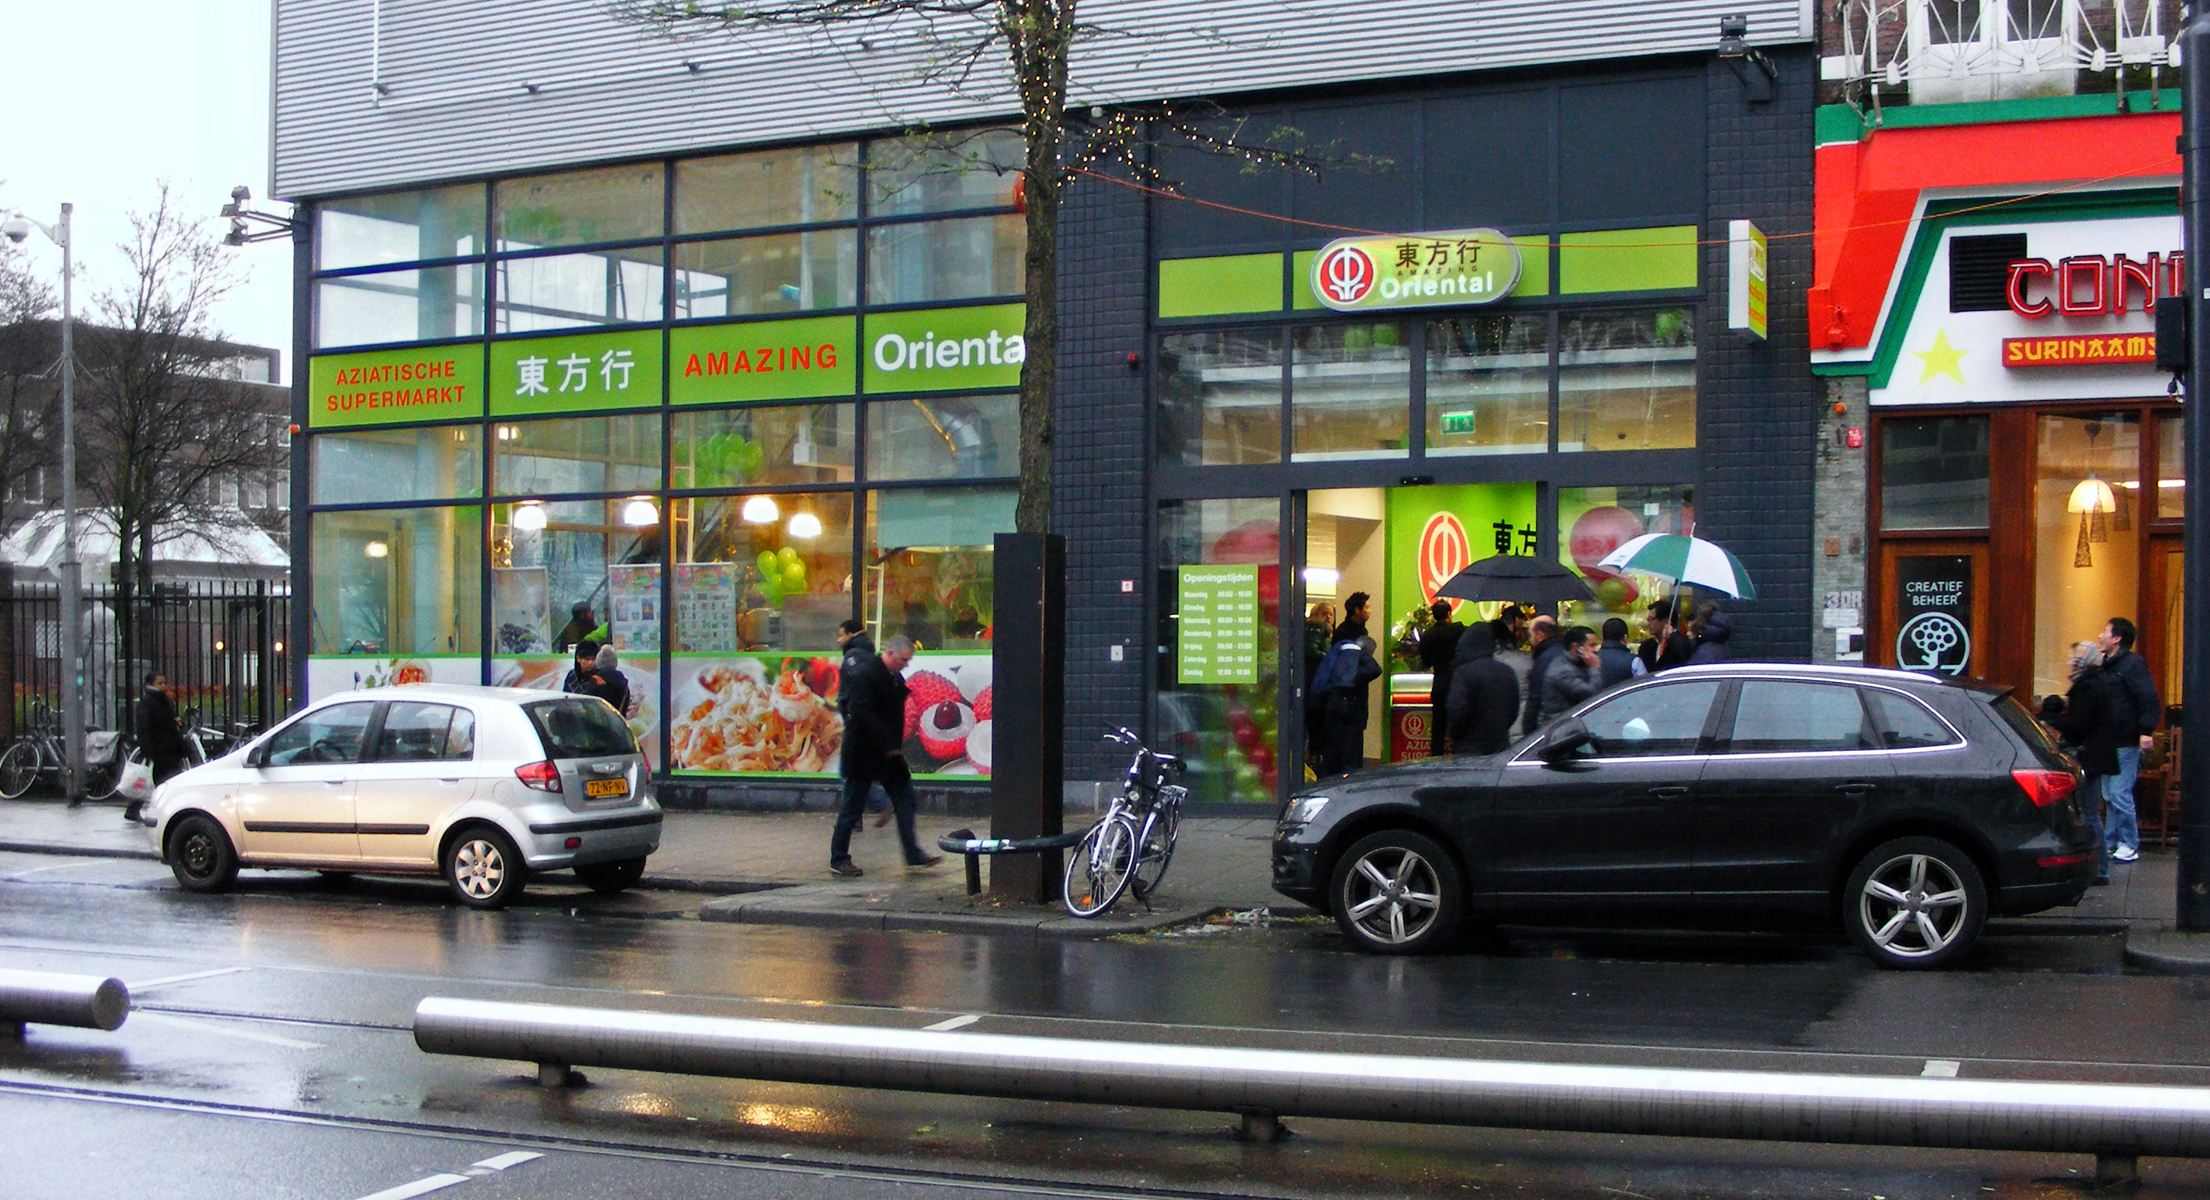 9210e36dac9 kruiskade | Aziatische-ingrediënten.nl